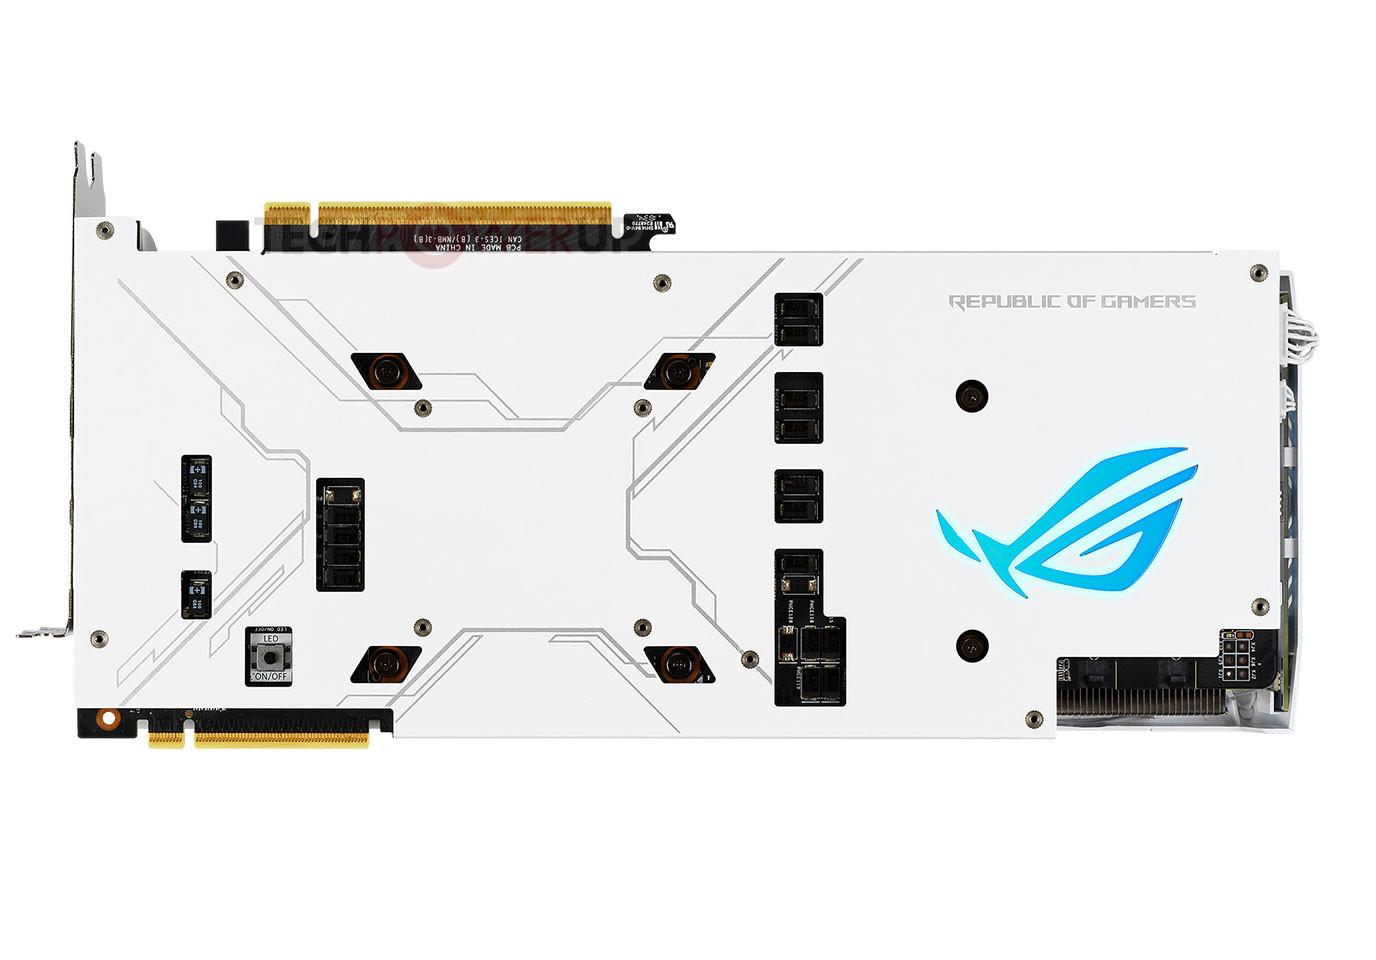 Asus Formally Launches Rog Strix Rtx Ti White Edition